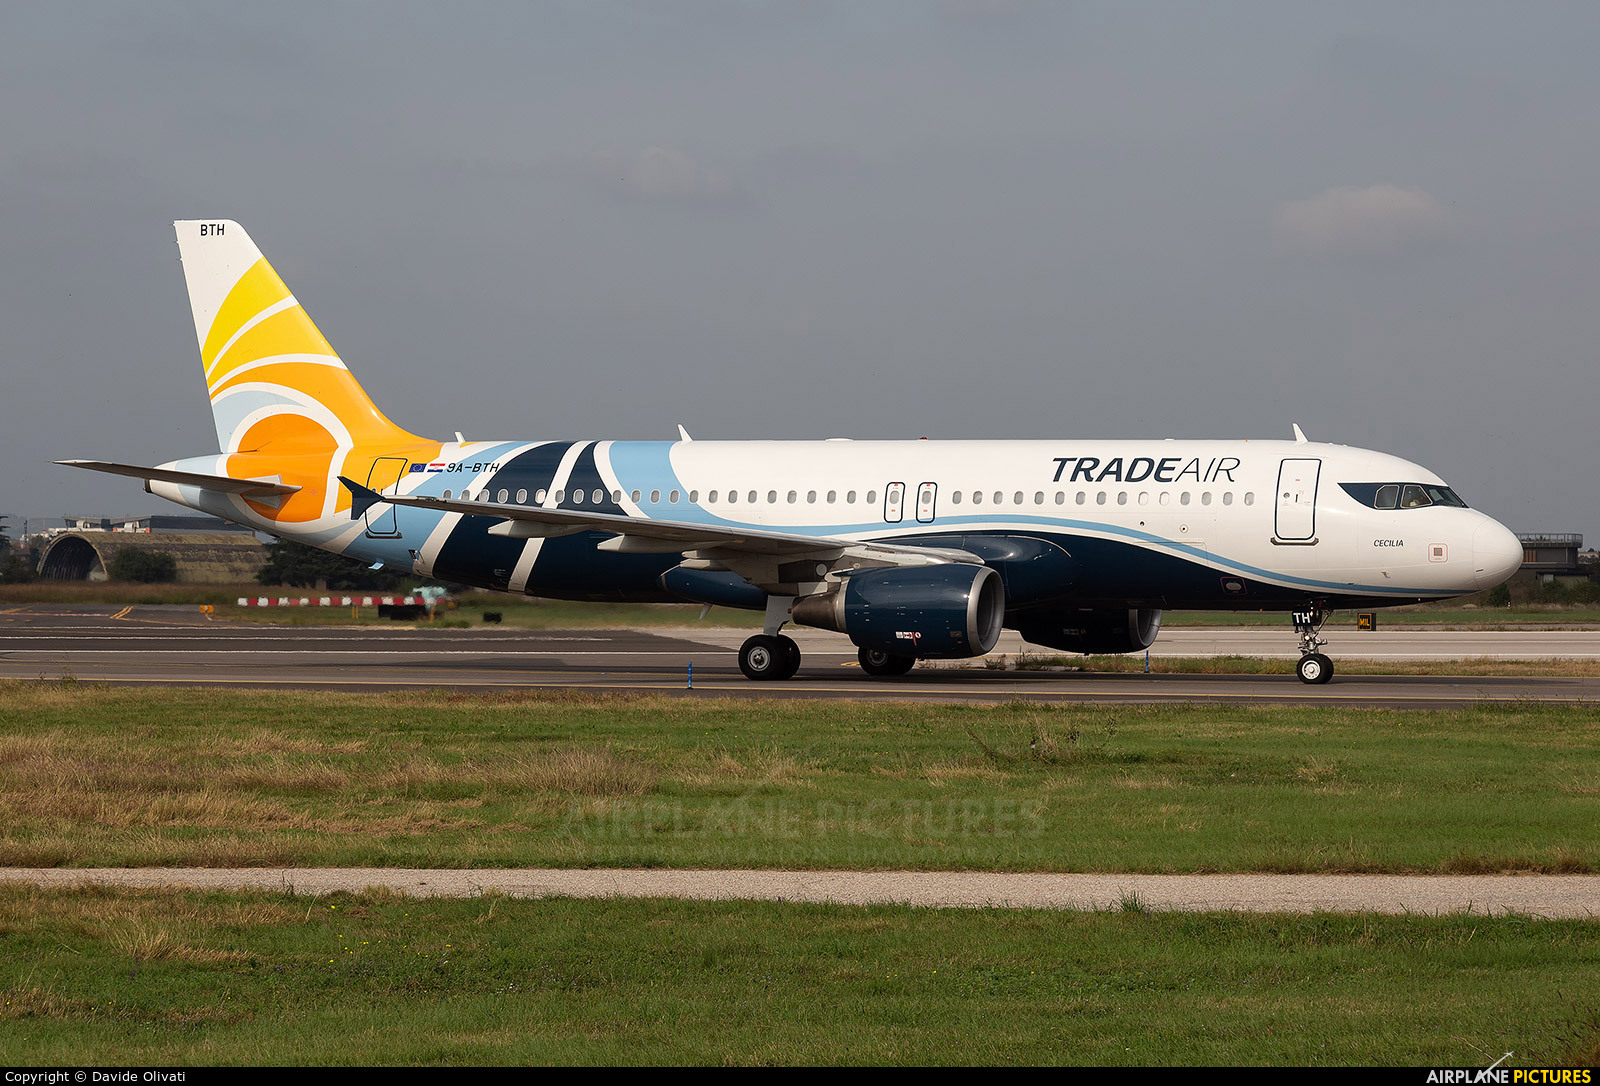 Trade Air 9A-BTH aircraft at Verona - Villafranca